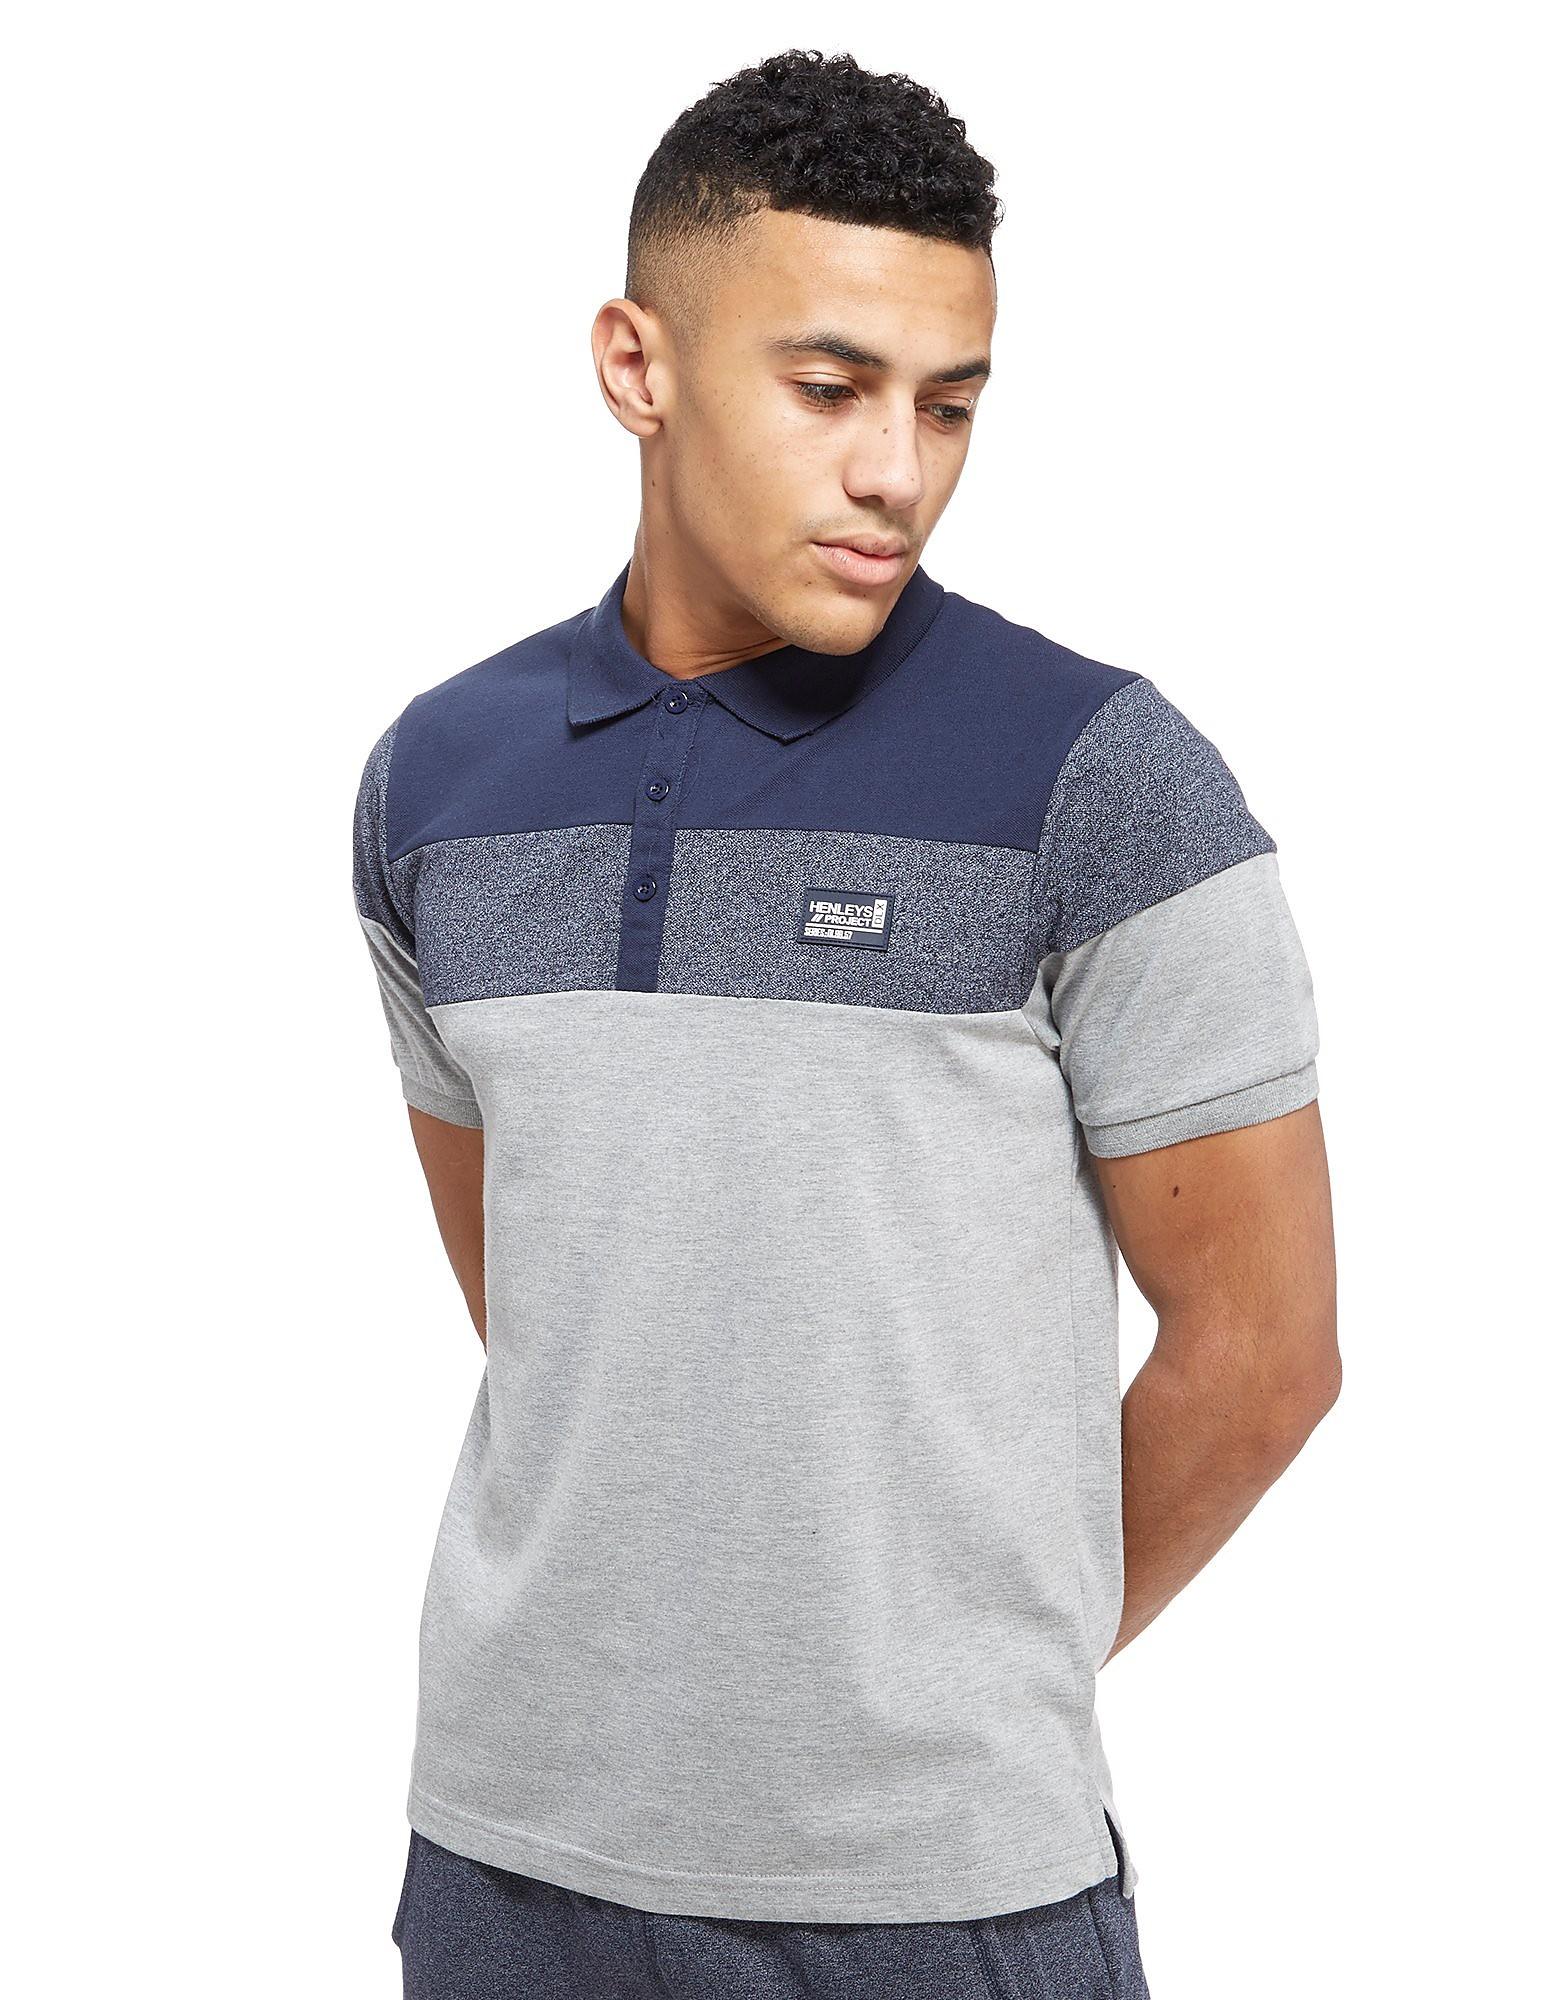 Henleys Cult Polo Shirt